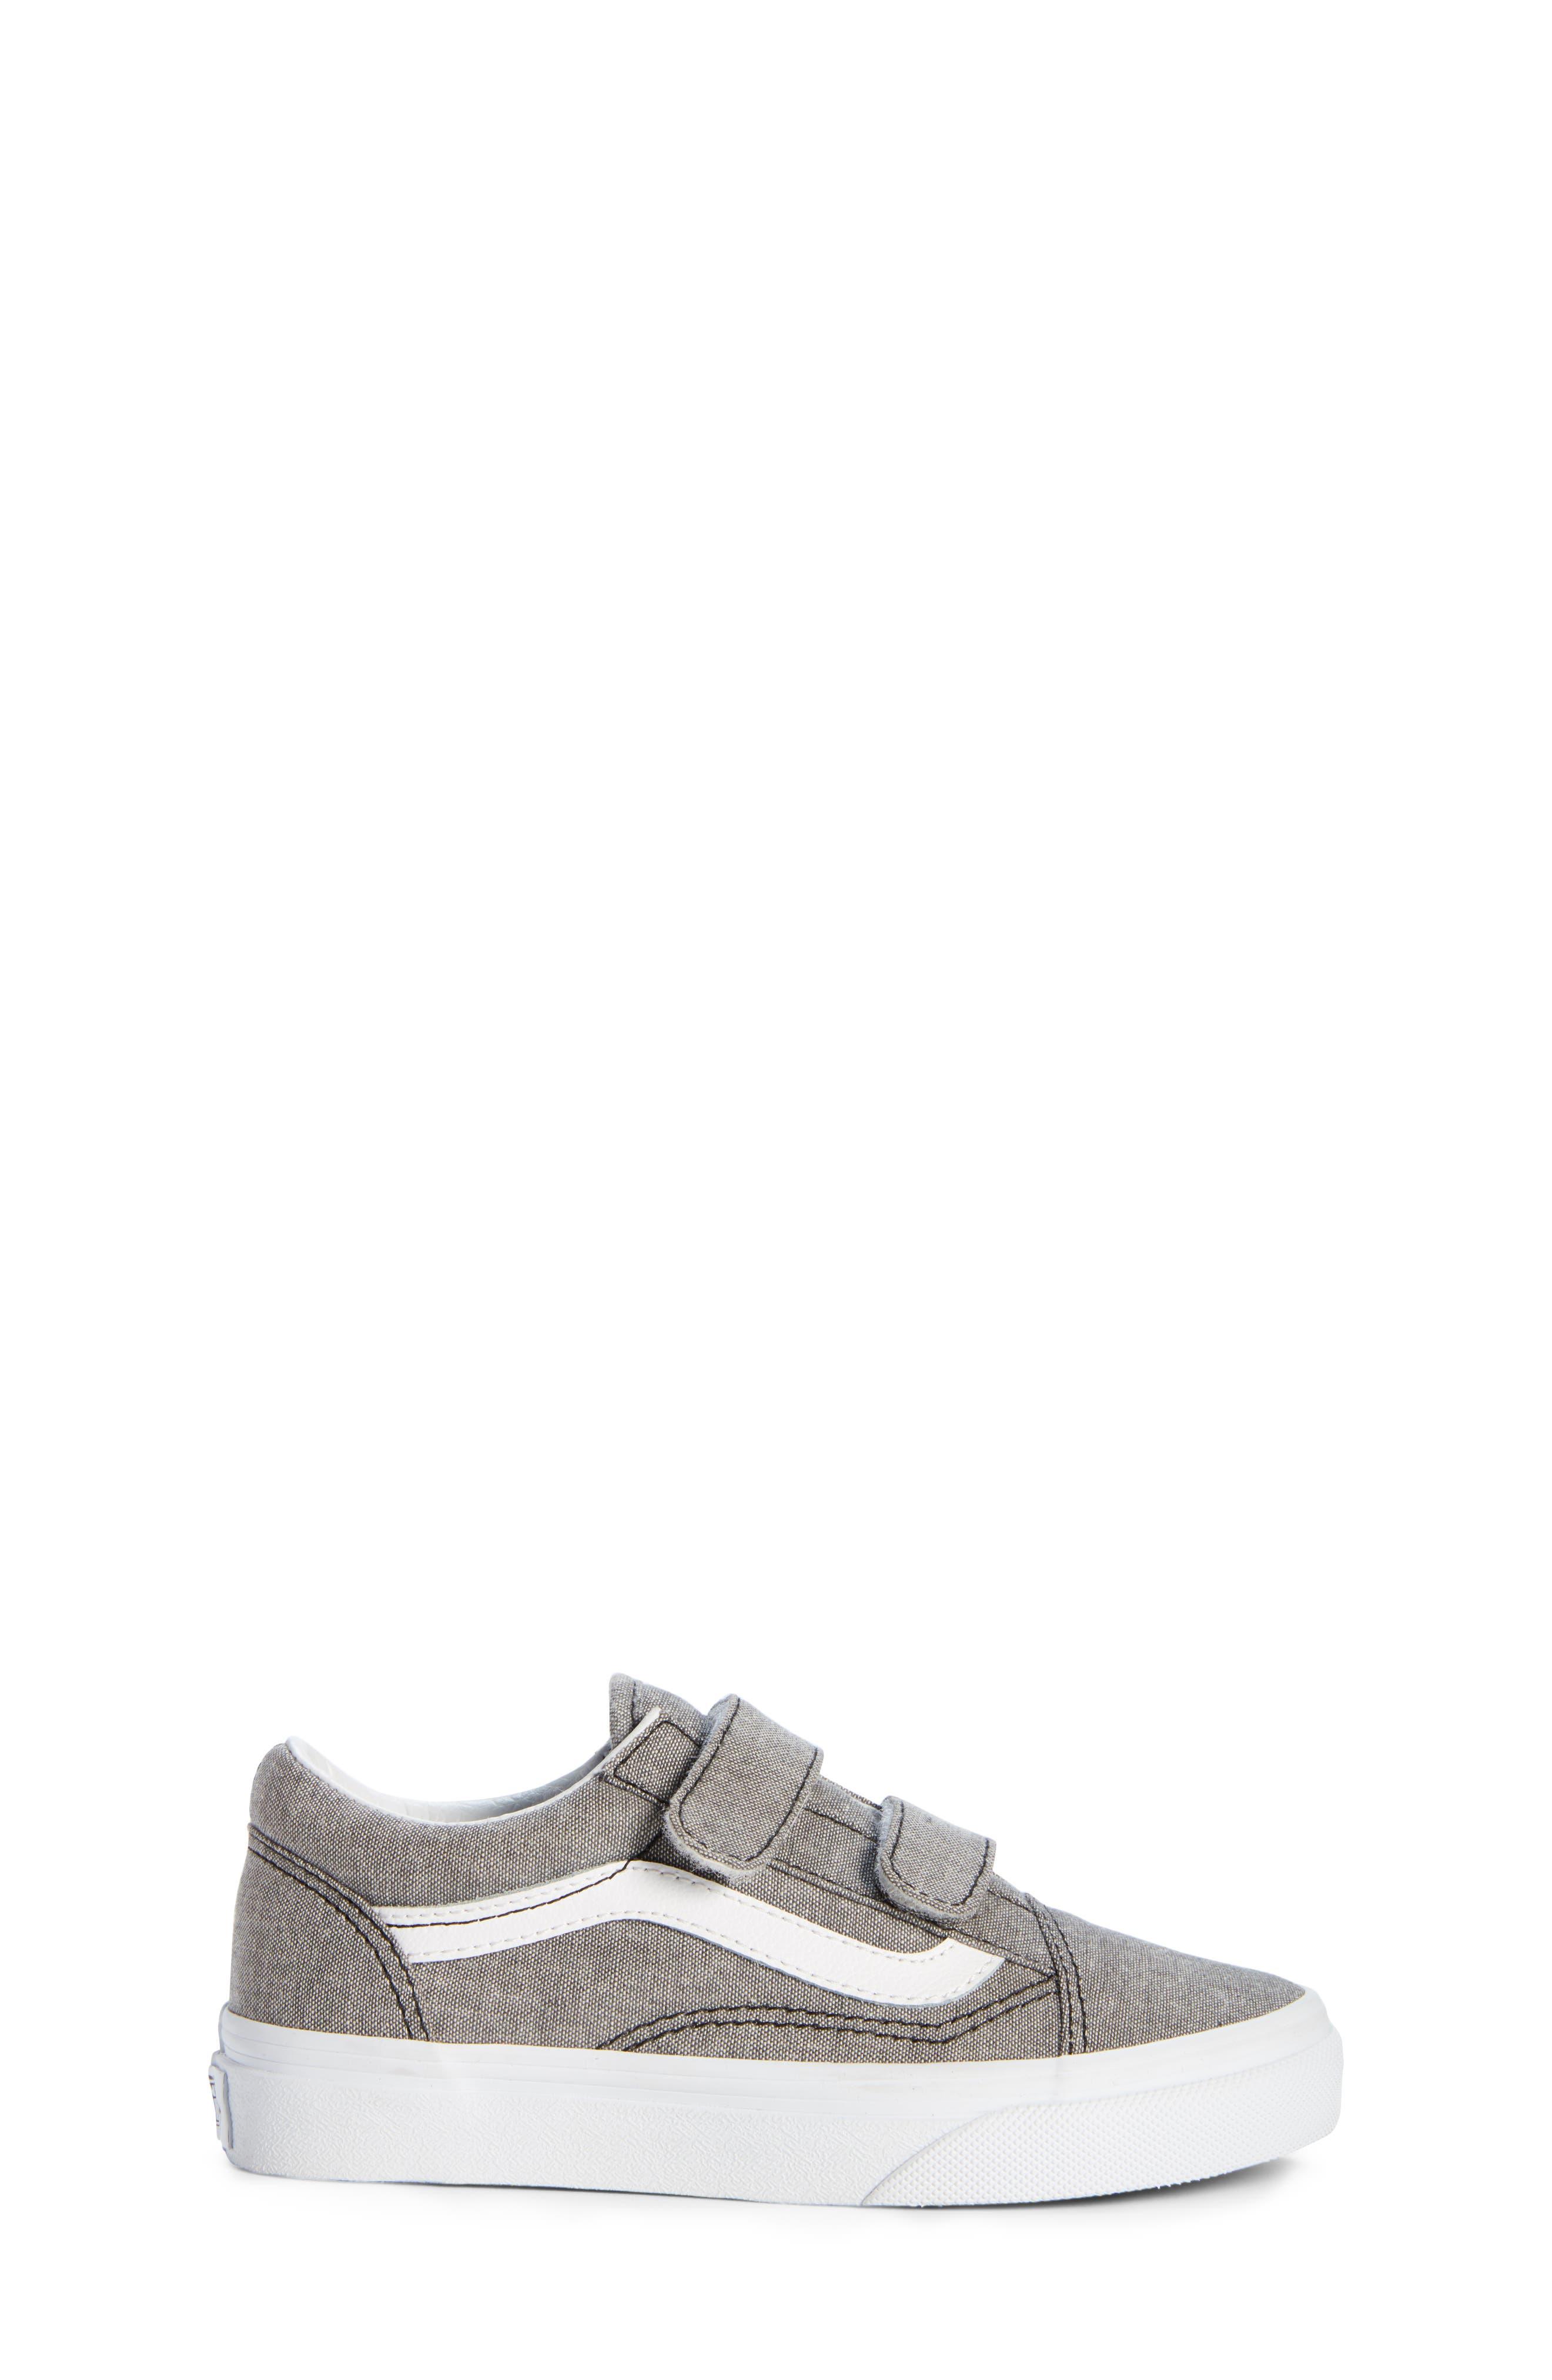 'Old Skool' Sneaker,                             Alternate thumbnail 3, color,                             OXFORD GRAY TRUE WHITE